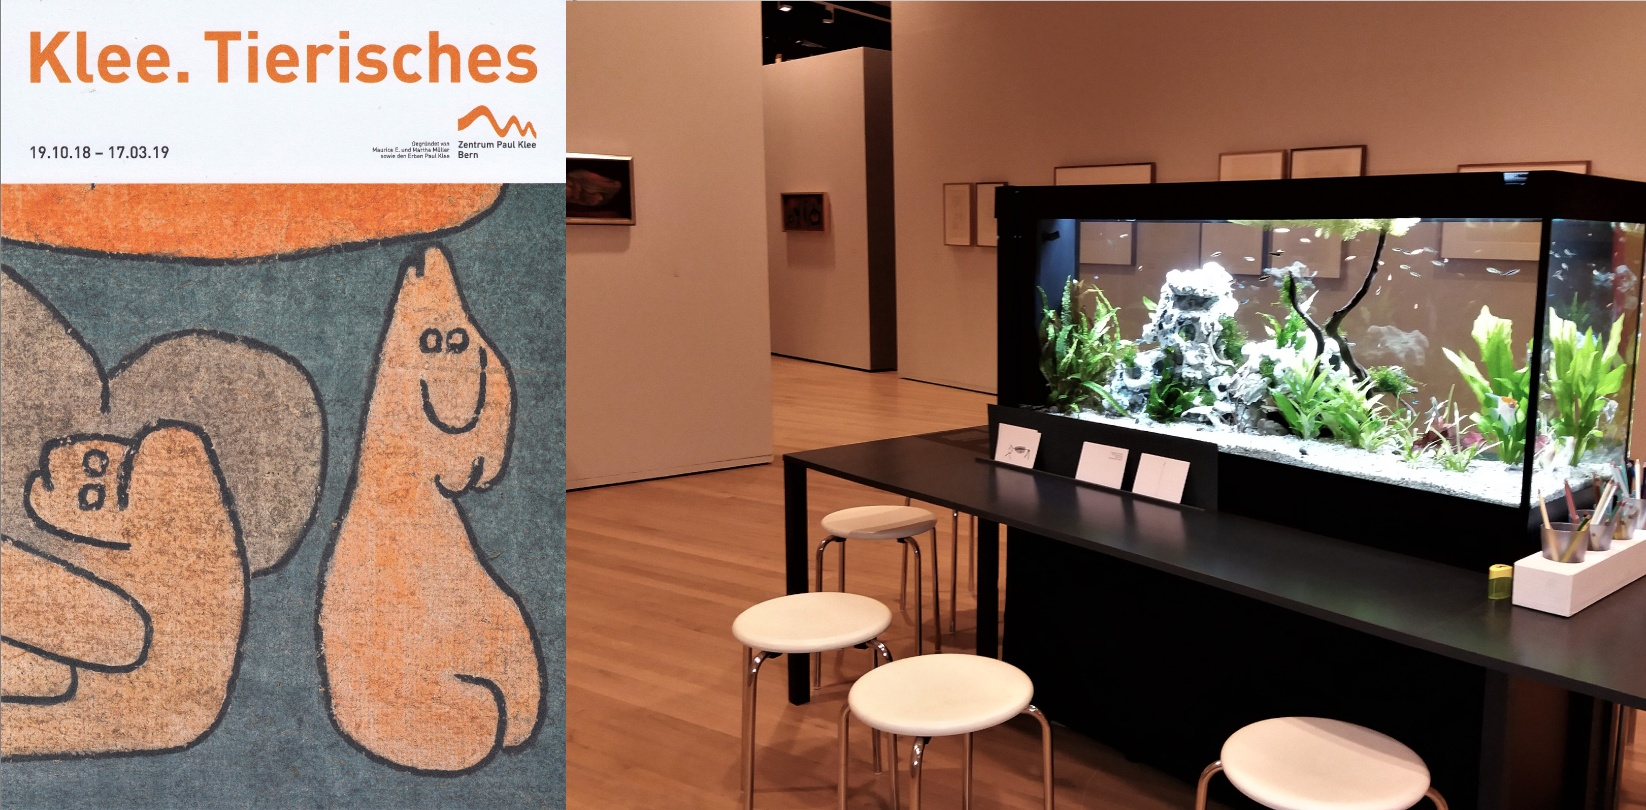 Im Zentrum Paul Klee in Bern